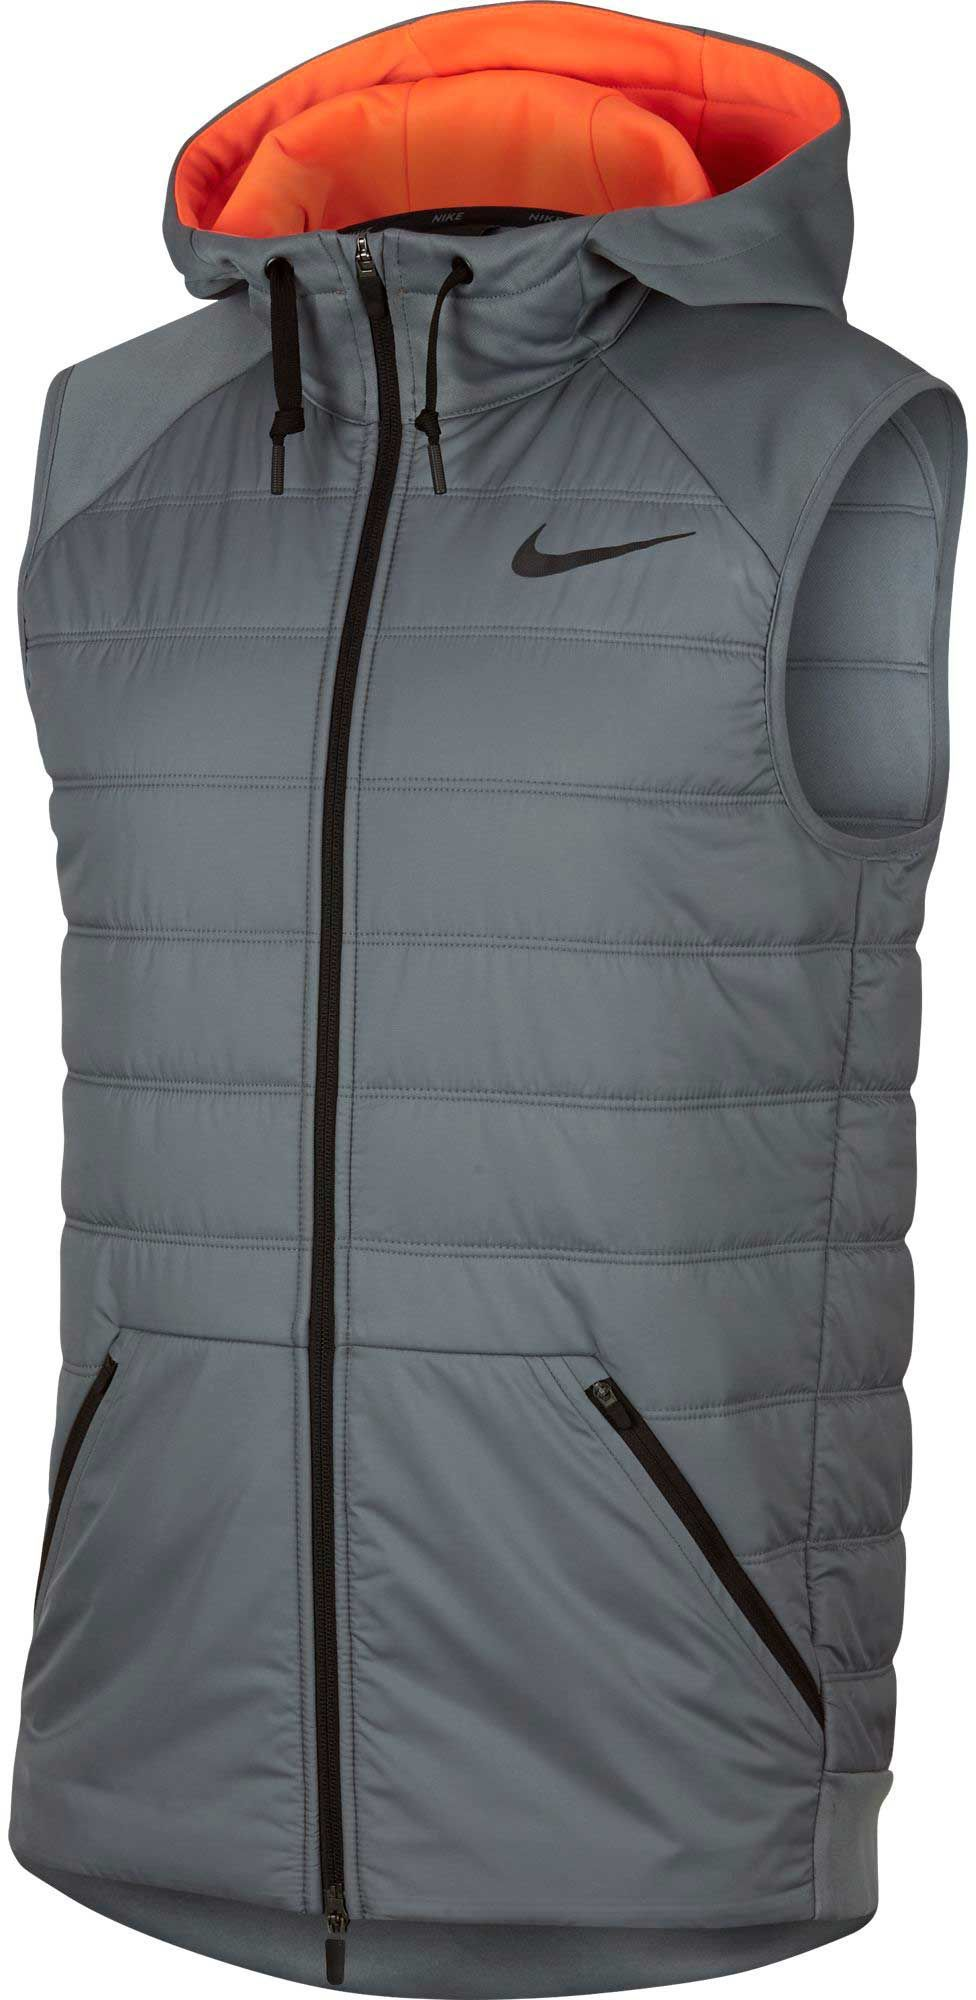 separation shoes 96006 33276 Nike Mens Winterized Therma Training Vest, Size Medium, Cool GreyHyper  Crimson